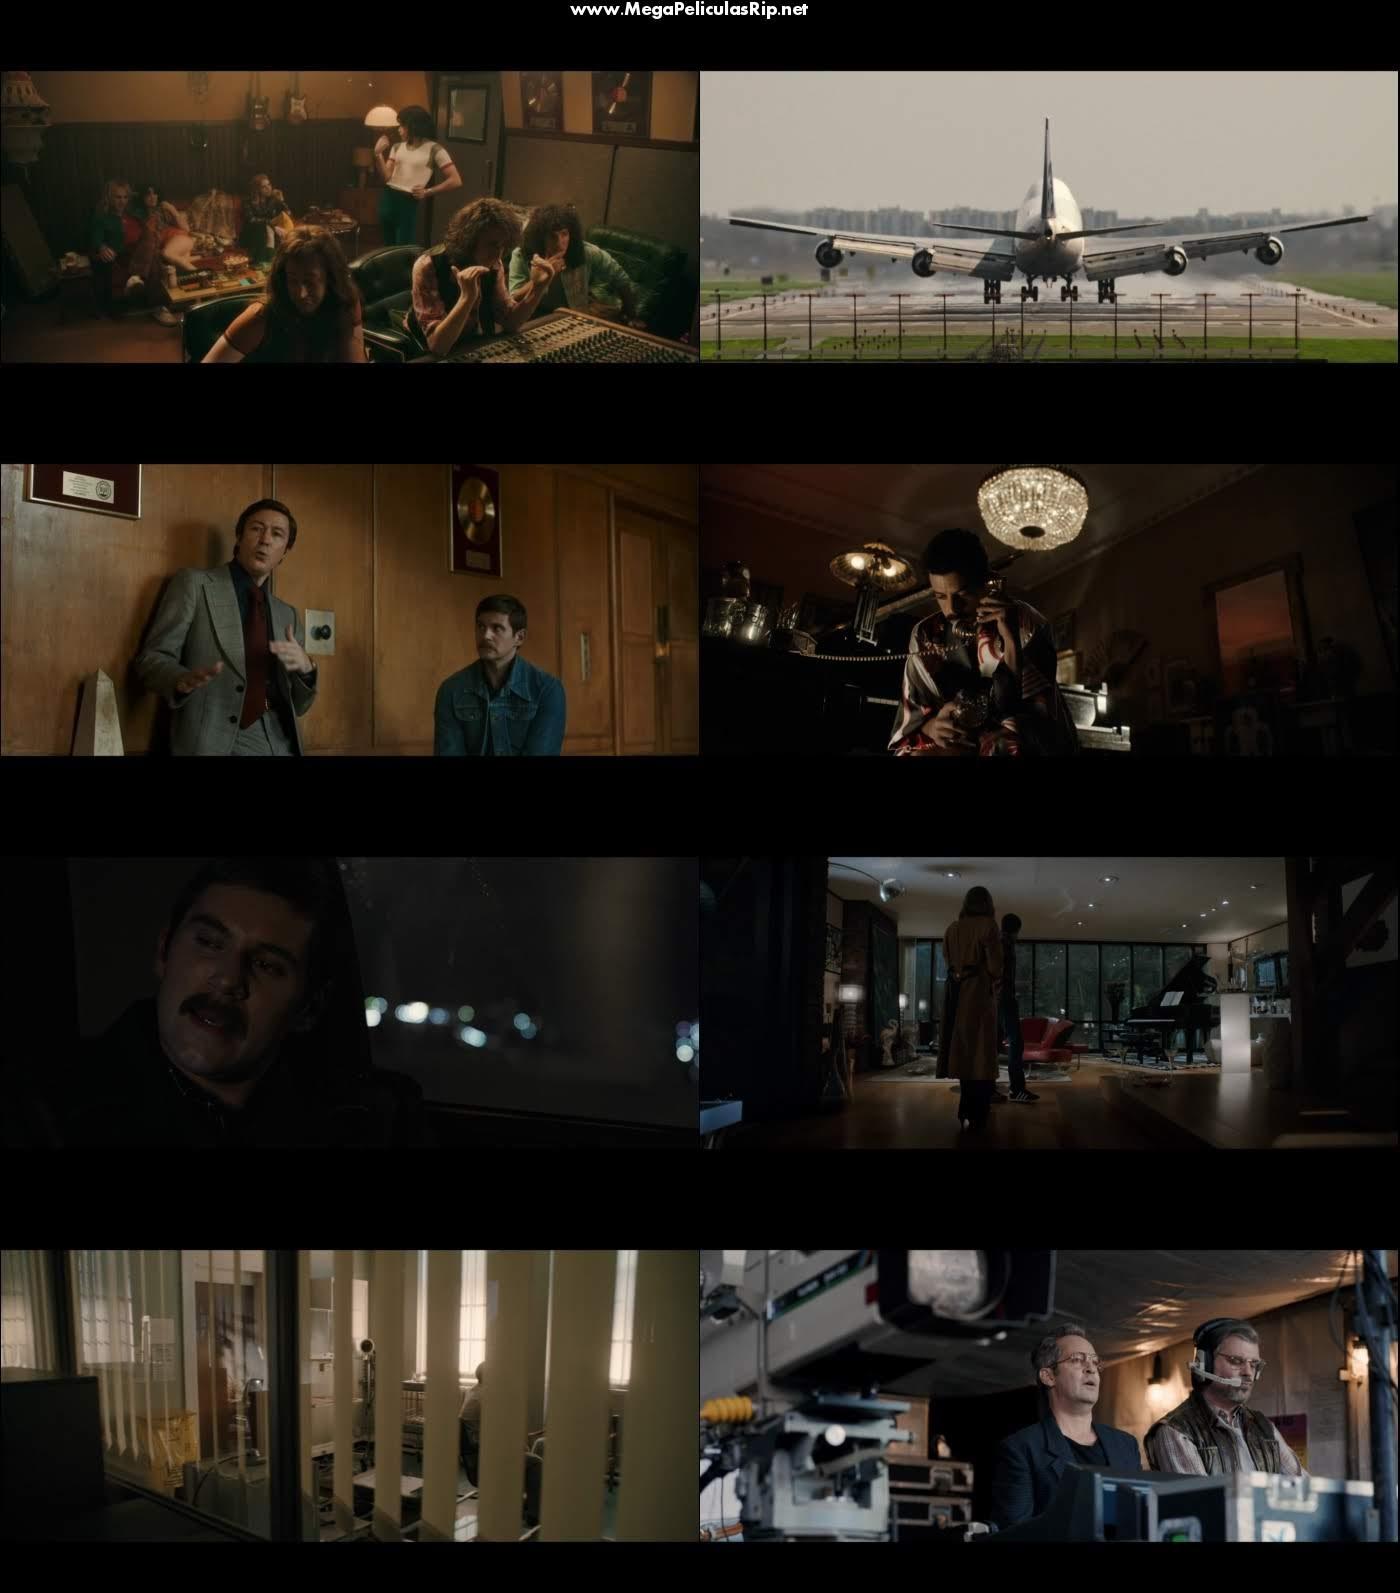 Bohemian Rhapsody 1080p Latino Ingles Mega Megapeliculasrip Megapeliculasrip